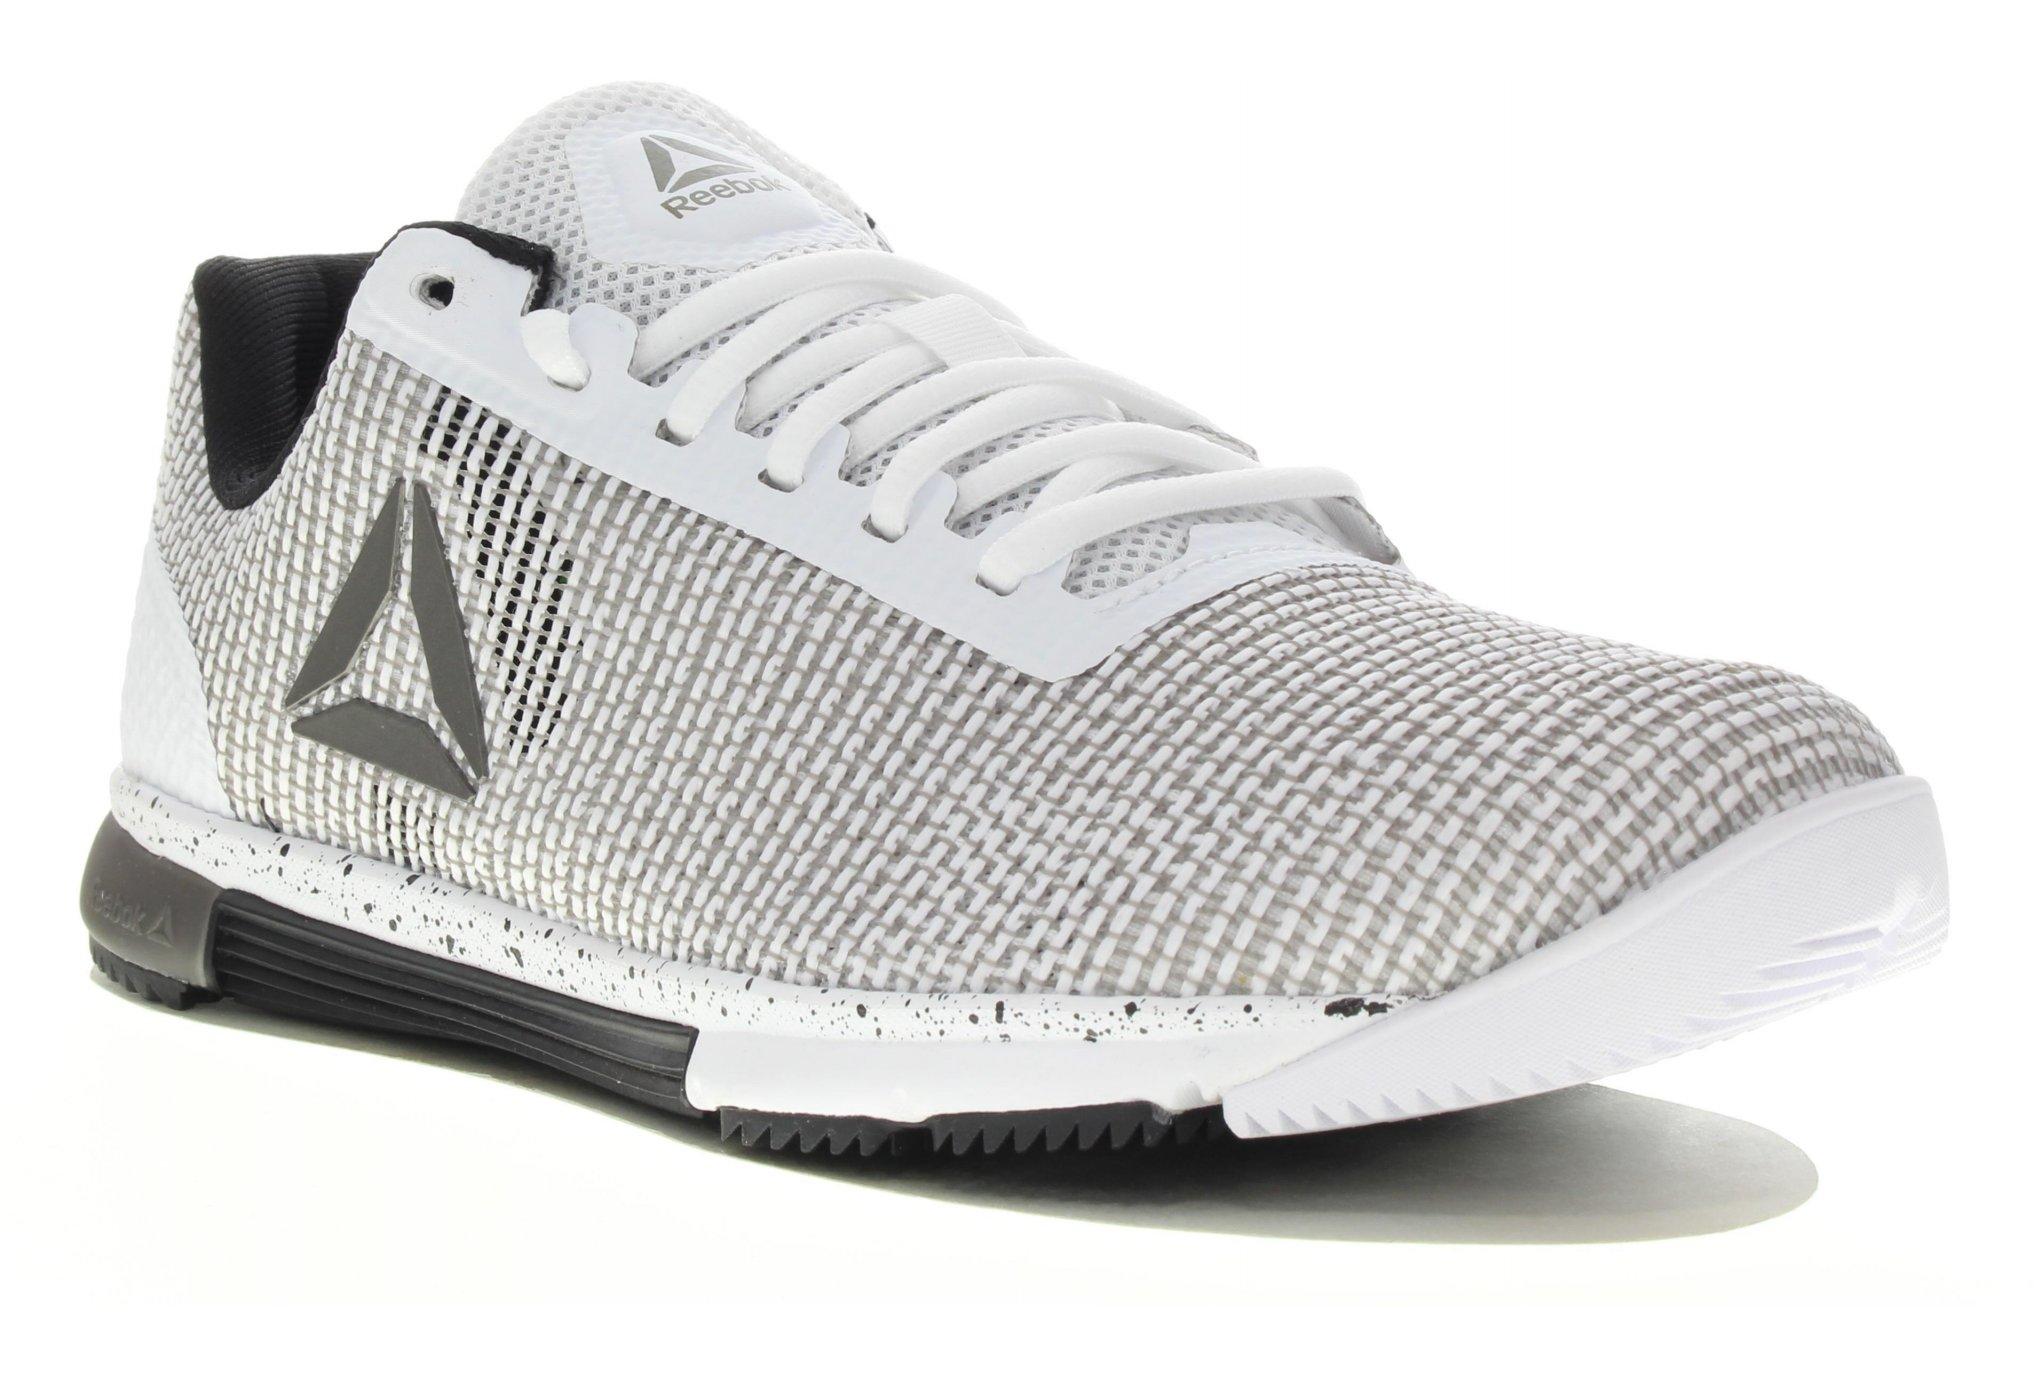 Reebok Crossfit Speed TR Flexweave W Chaussures running femme